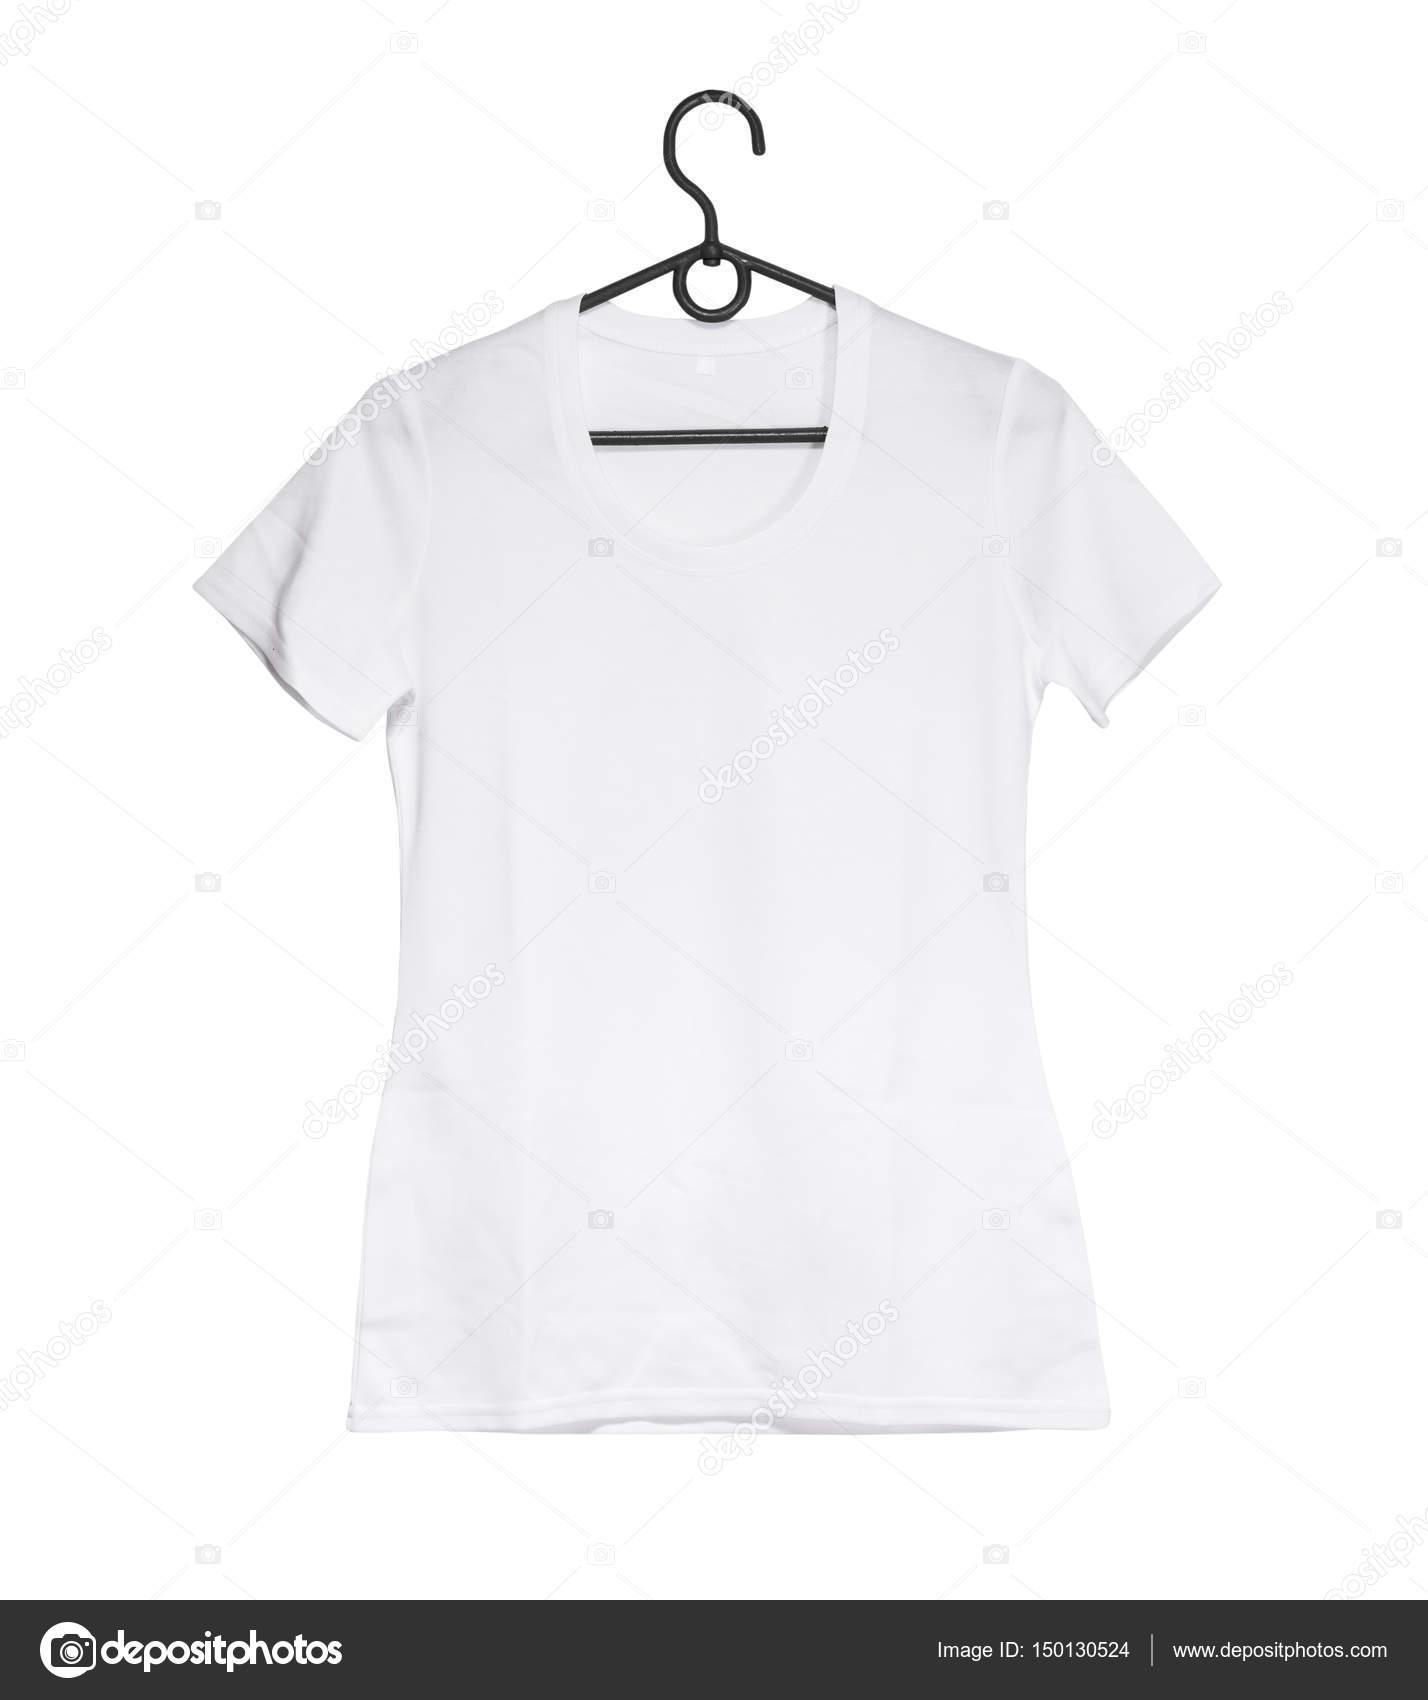 weiße Frau T-shirt auf Kleiderbügel — Stockfoto © GekaSkr #150130524